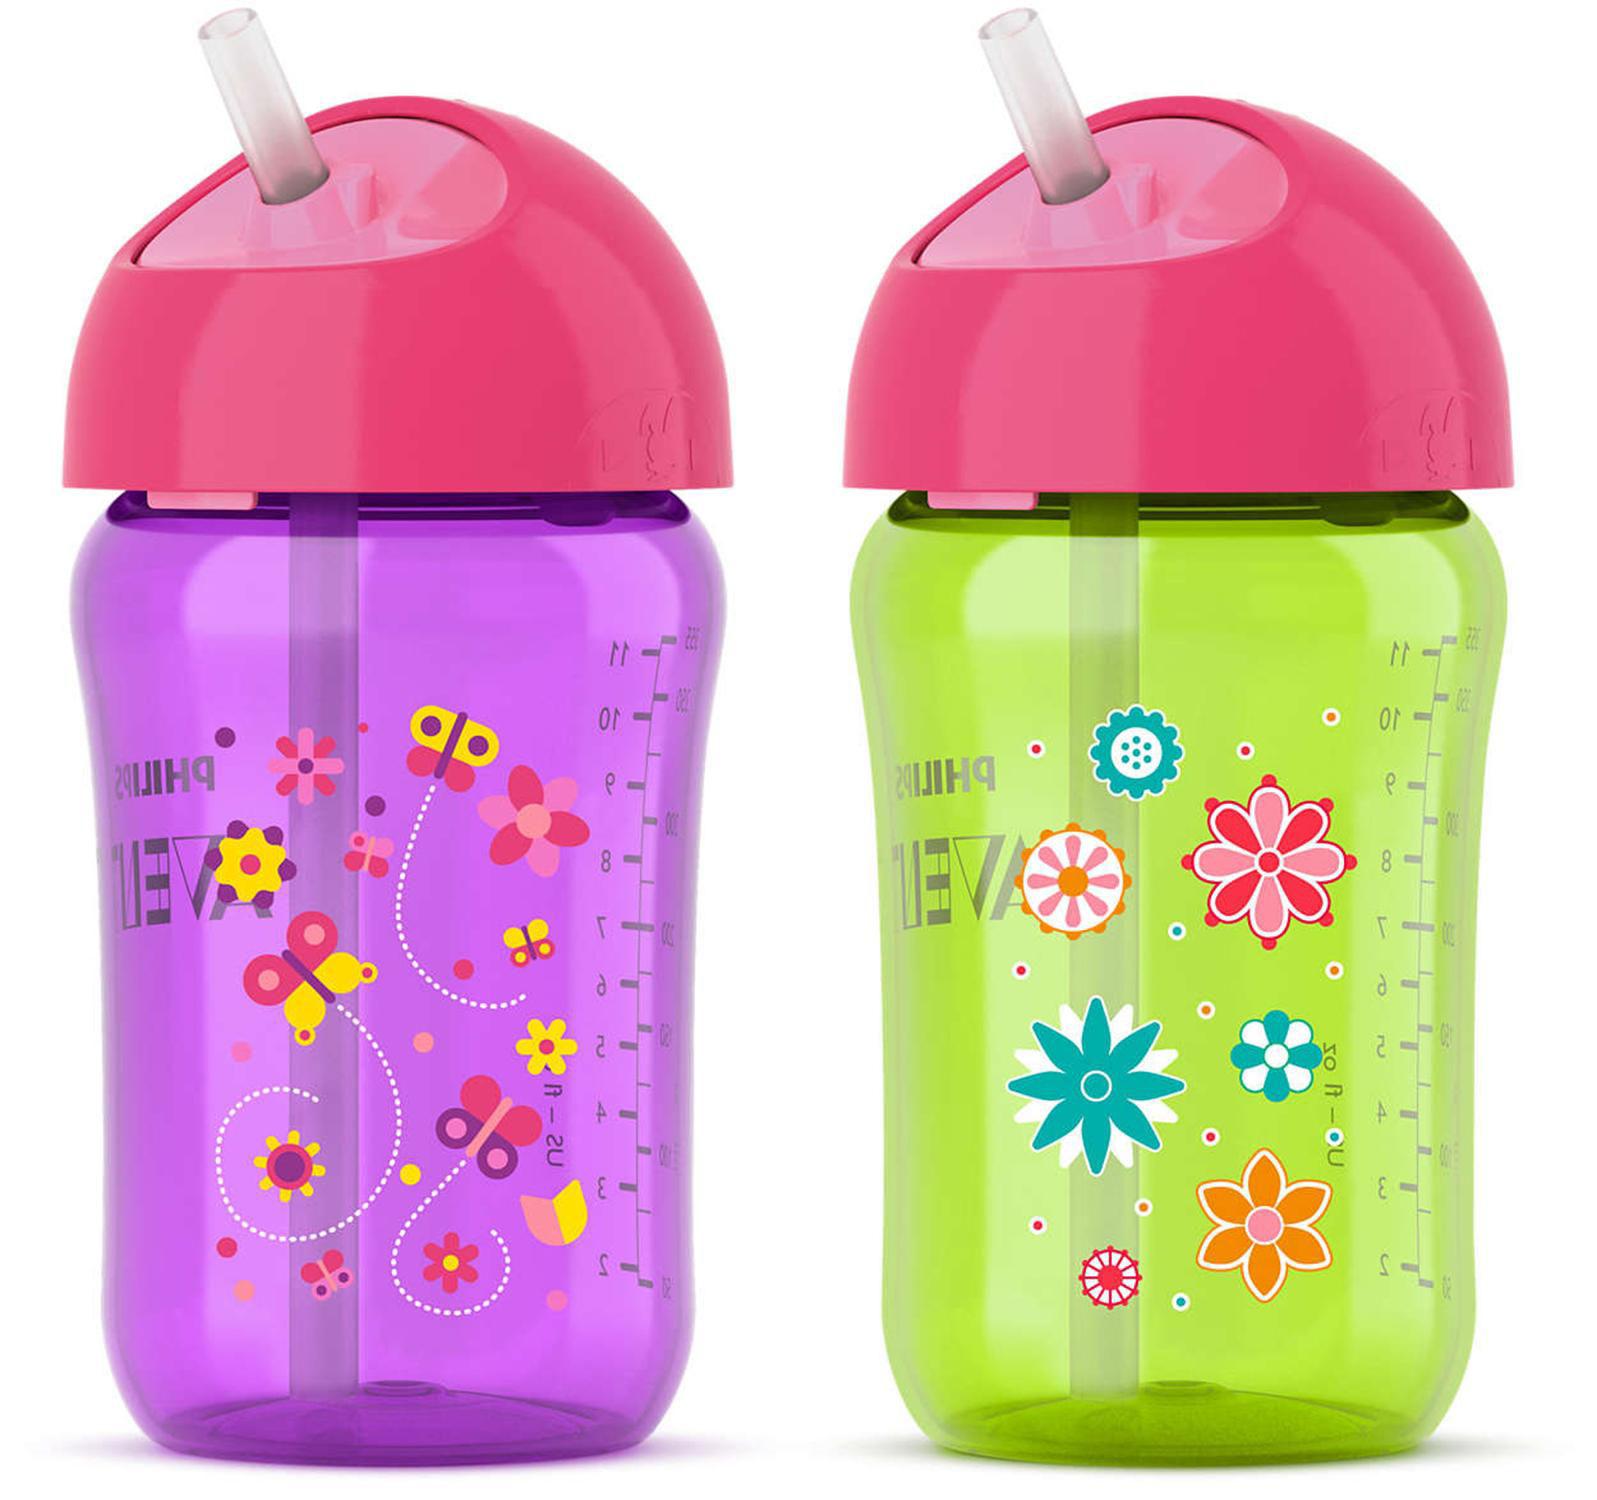 Philips Avent Pink Bottle Feeding